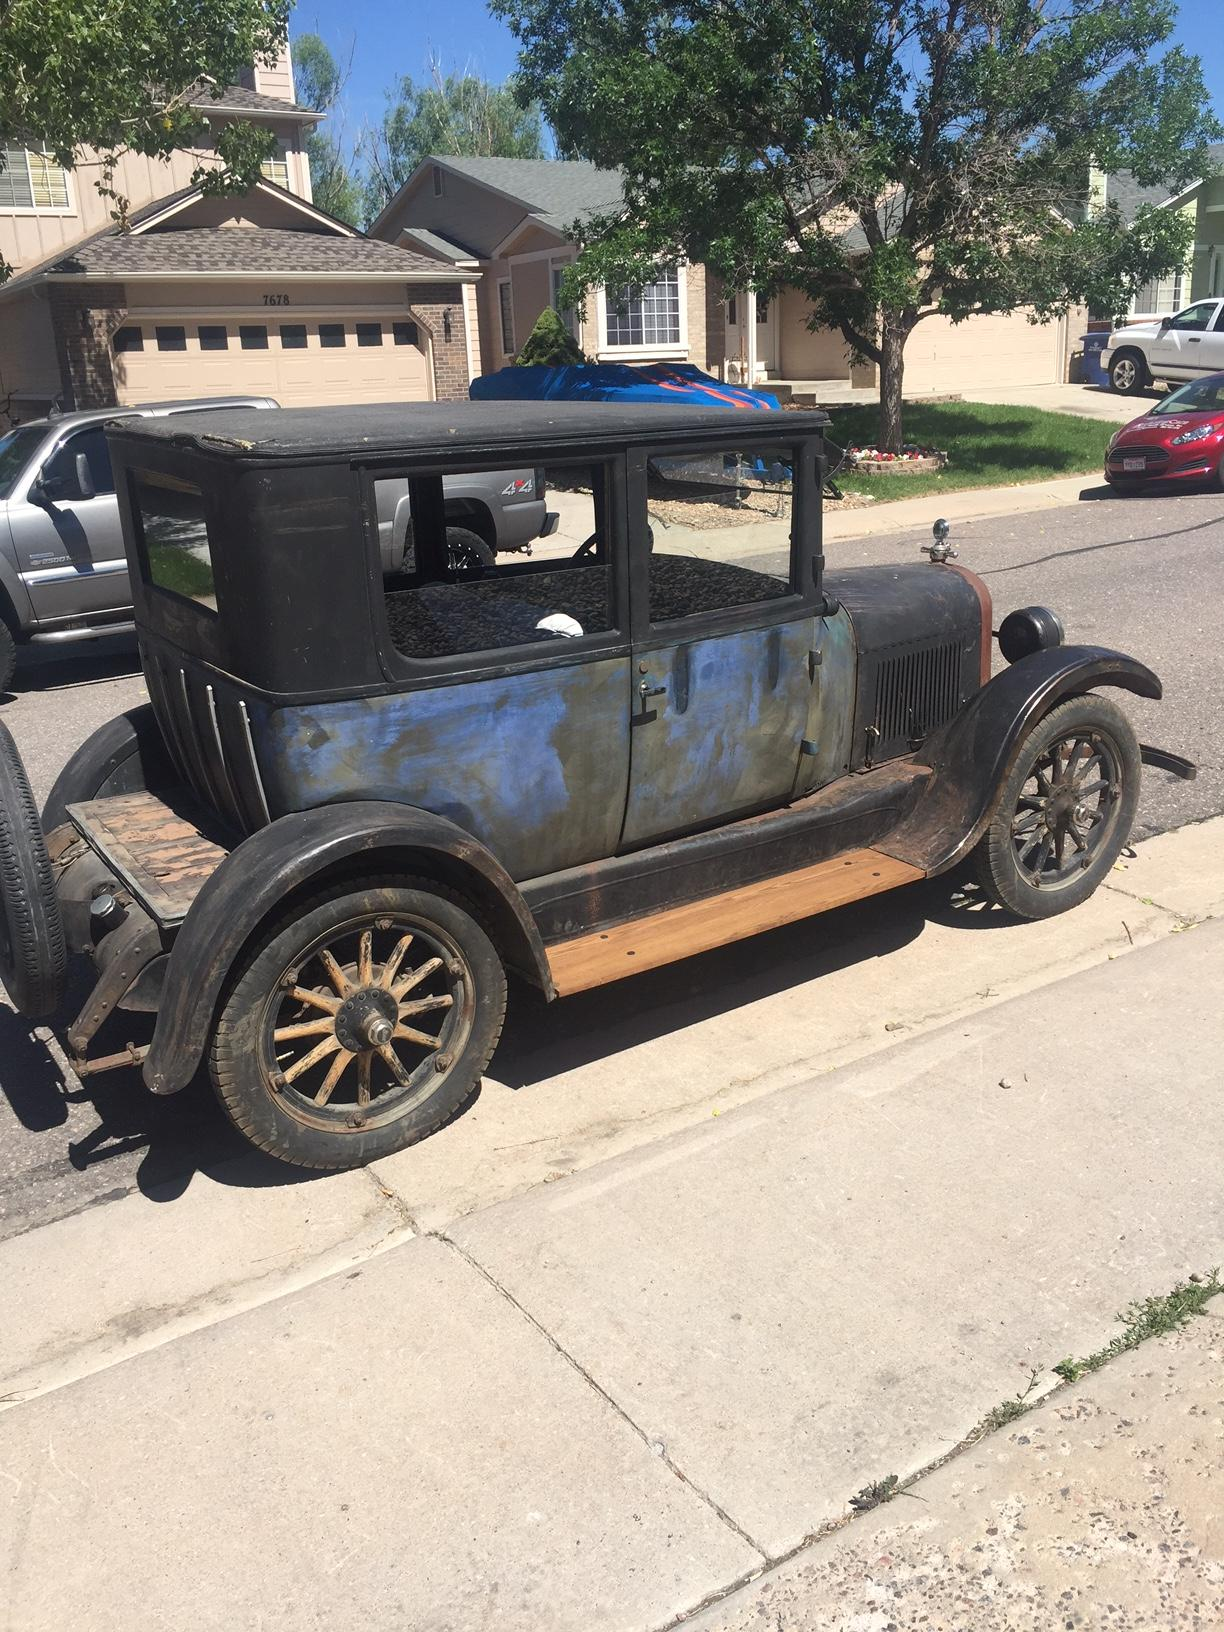 1923 Buick 23 Series 5 Passenger Sedan – 4 Cylinder - Cars For Sale ...